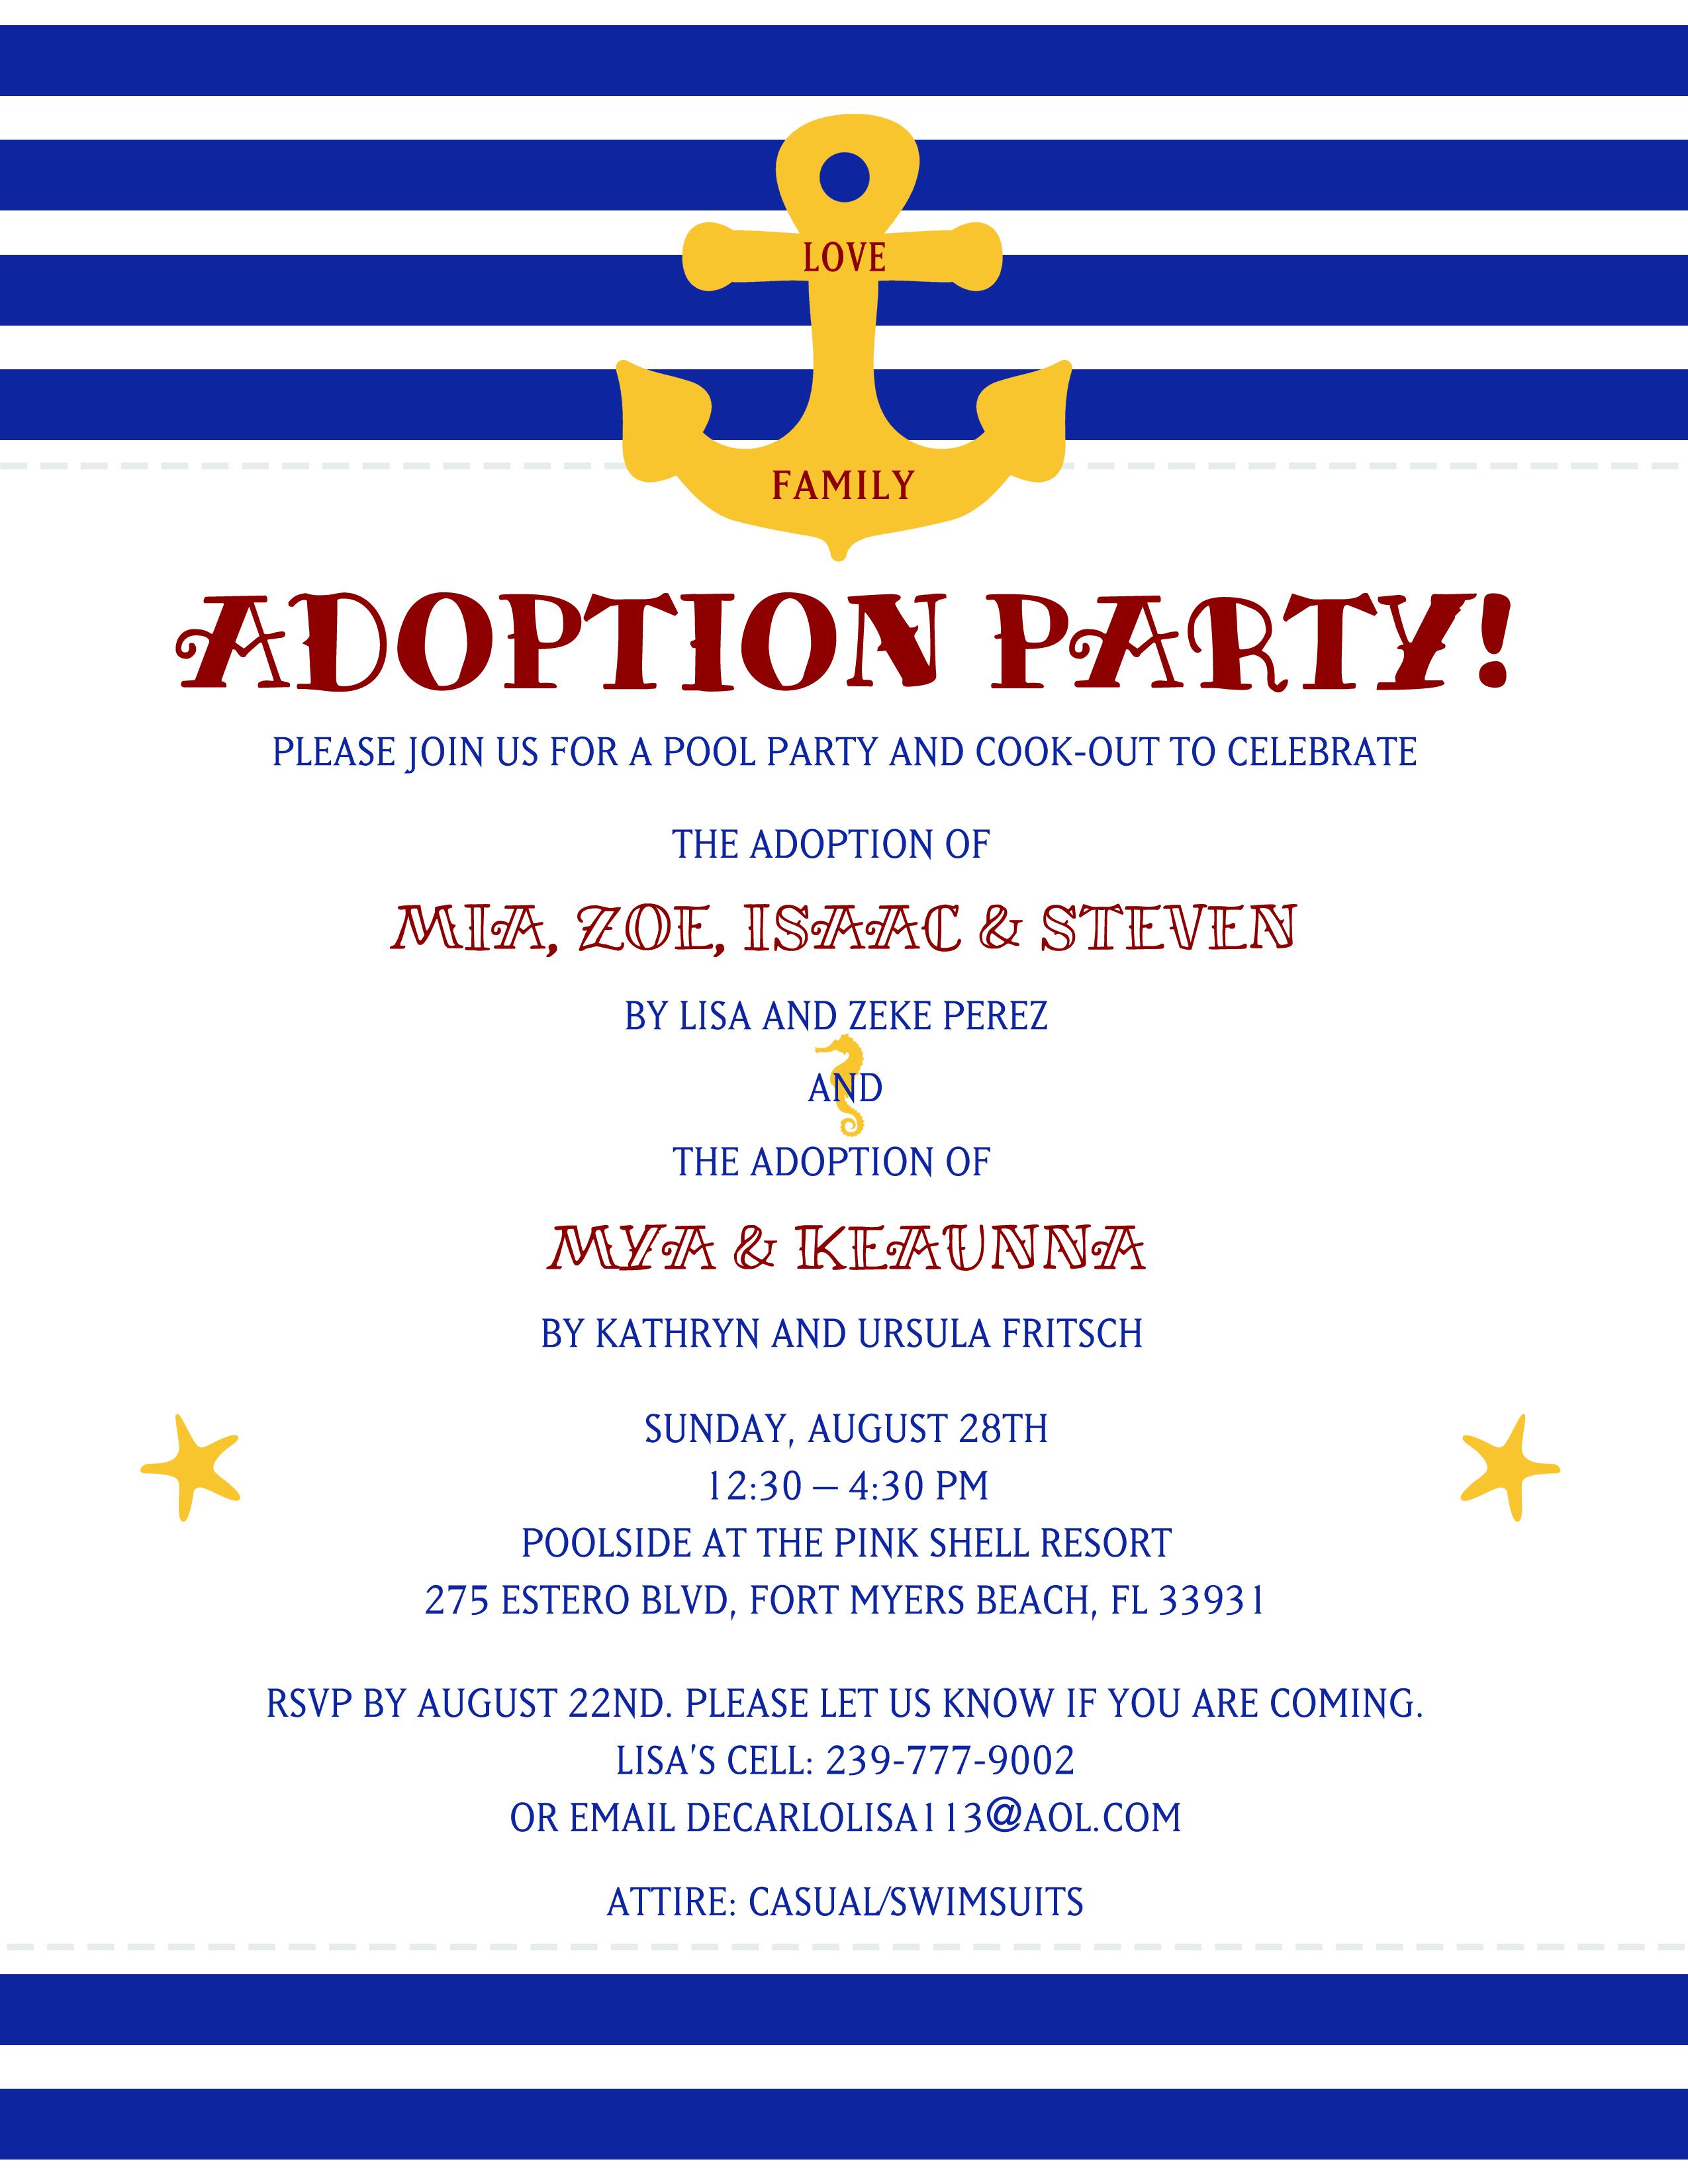 adoption party.jpg